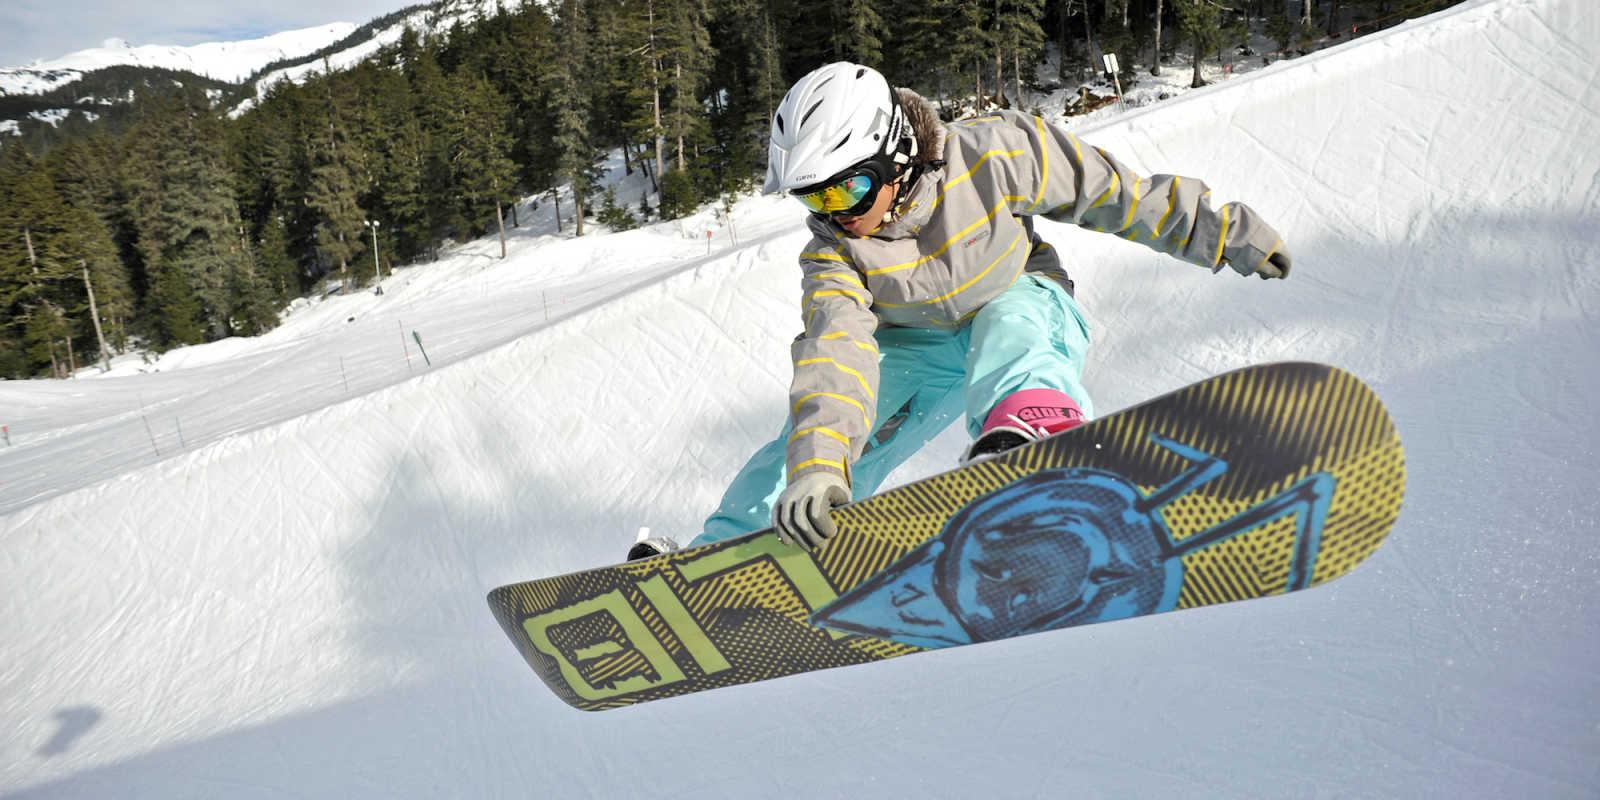 Alyeska resort snowboarding near Anchorage